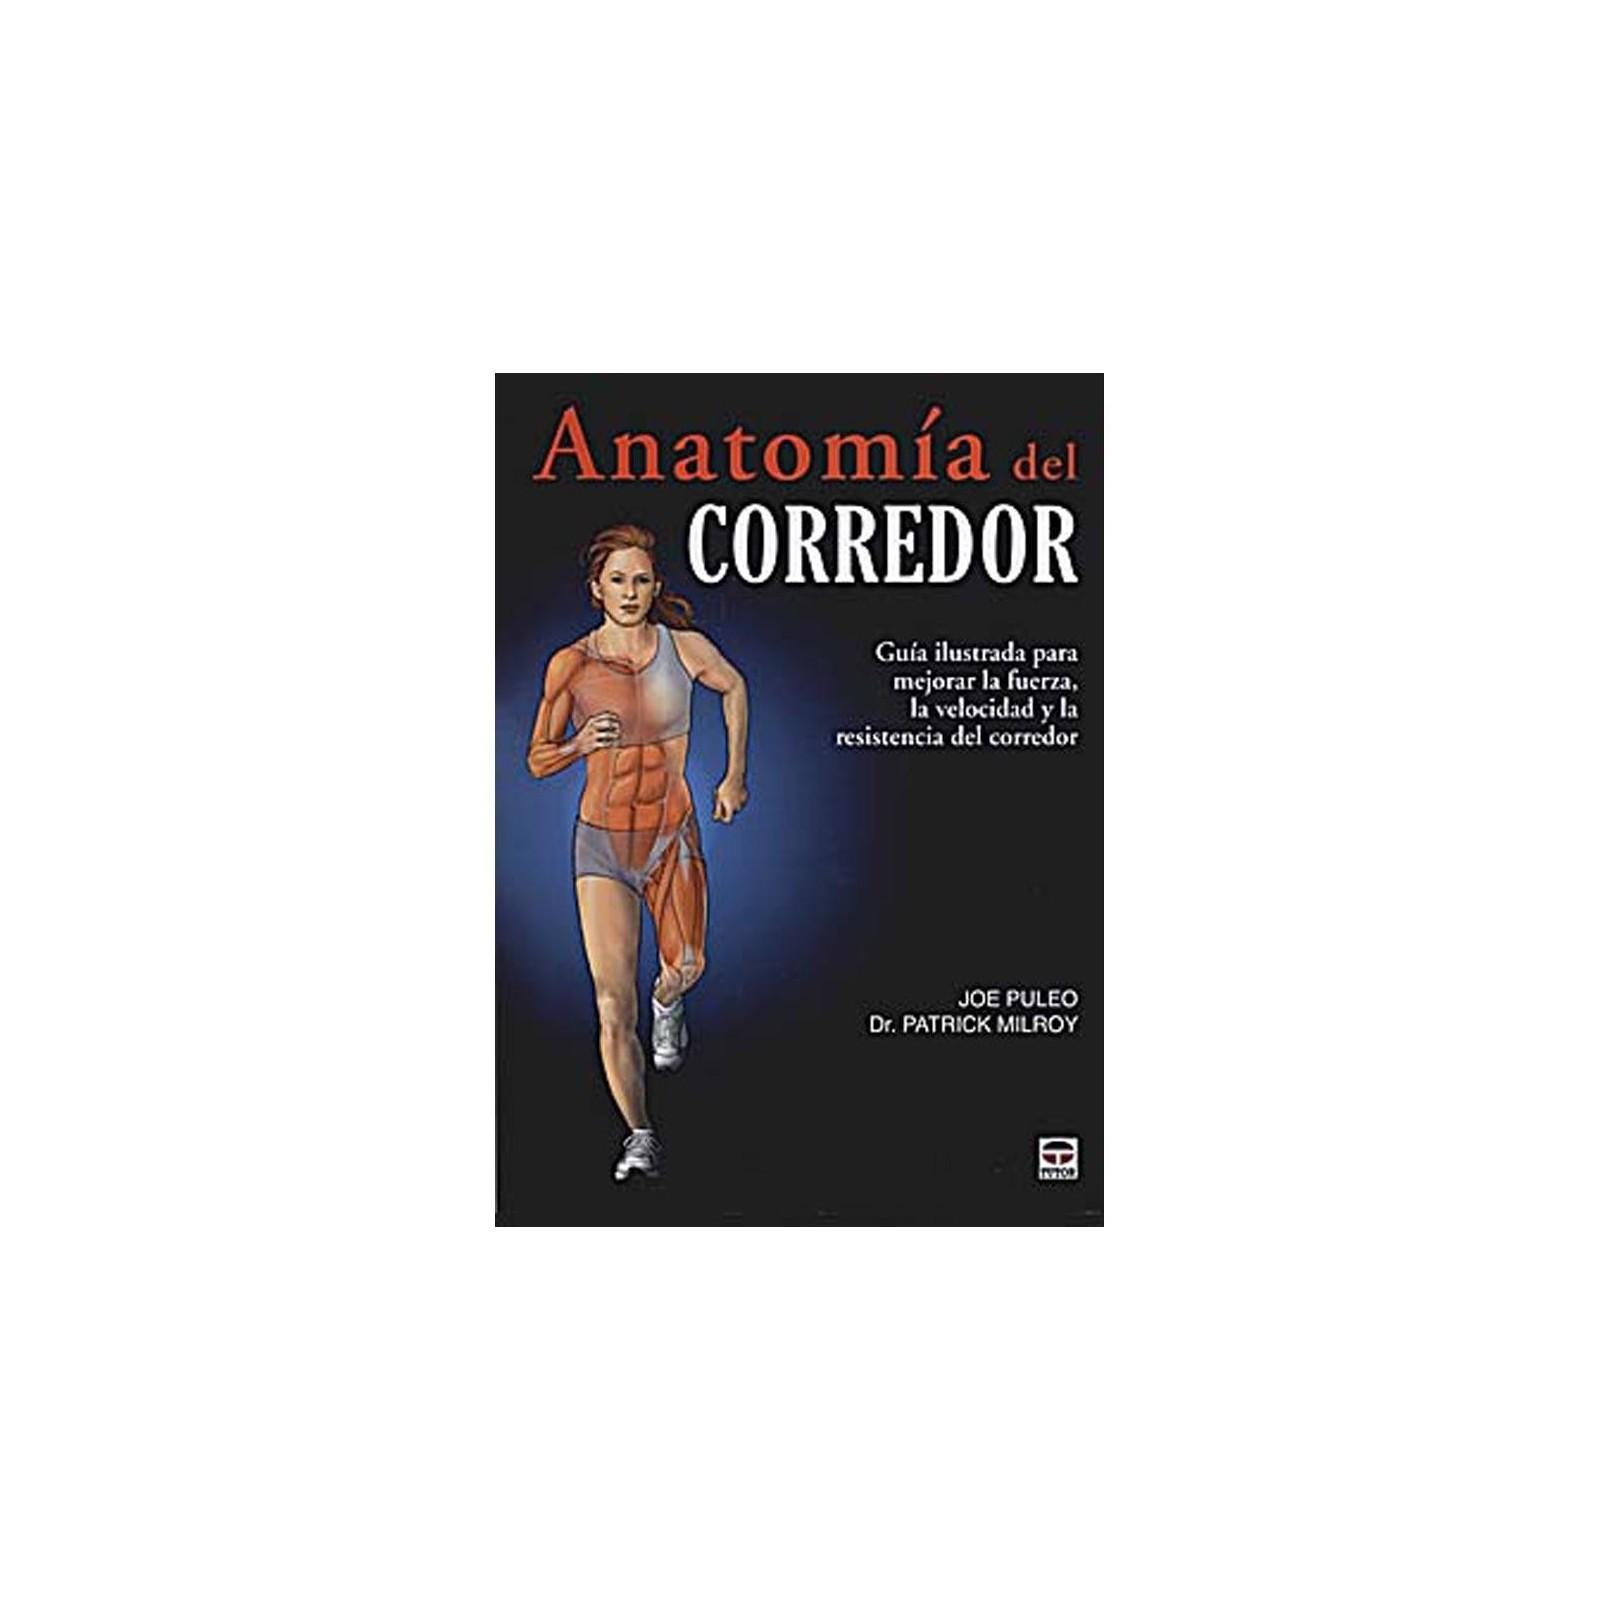 Bikila-ANATOMÍA DEL CORREDOR TUT502088. TUT502088